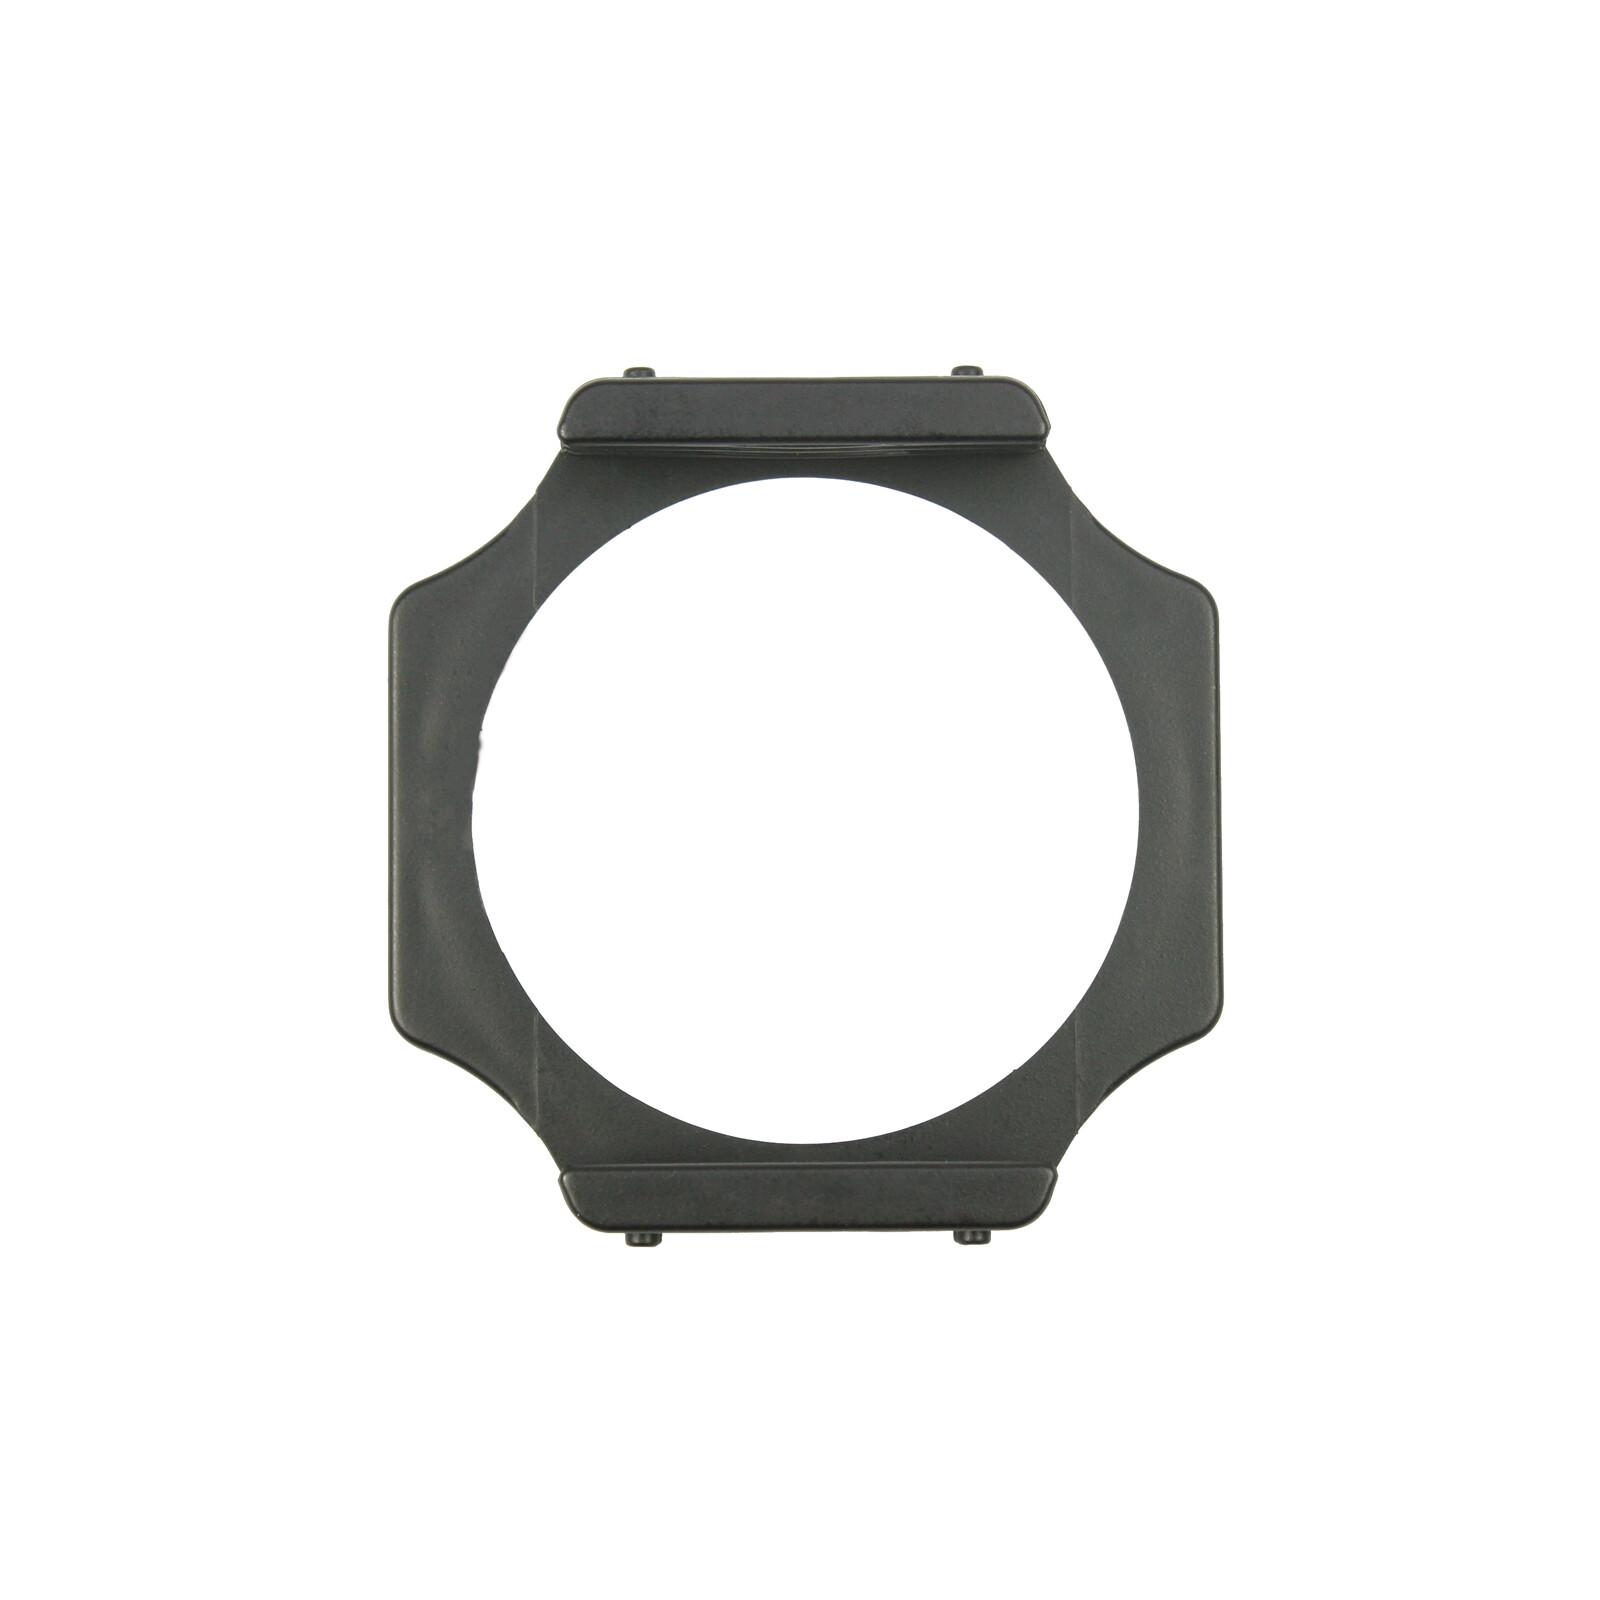 Dörr Go2 Metall Anschlussring 55mm